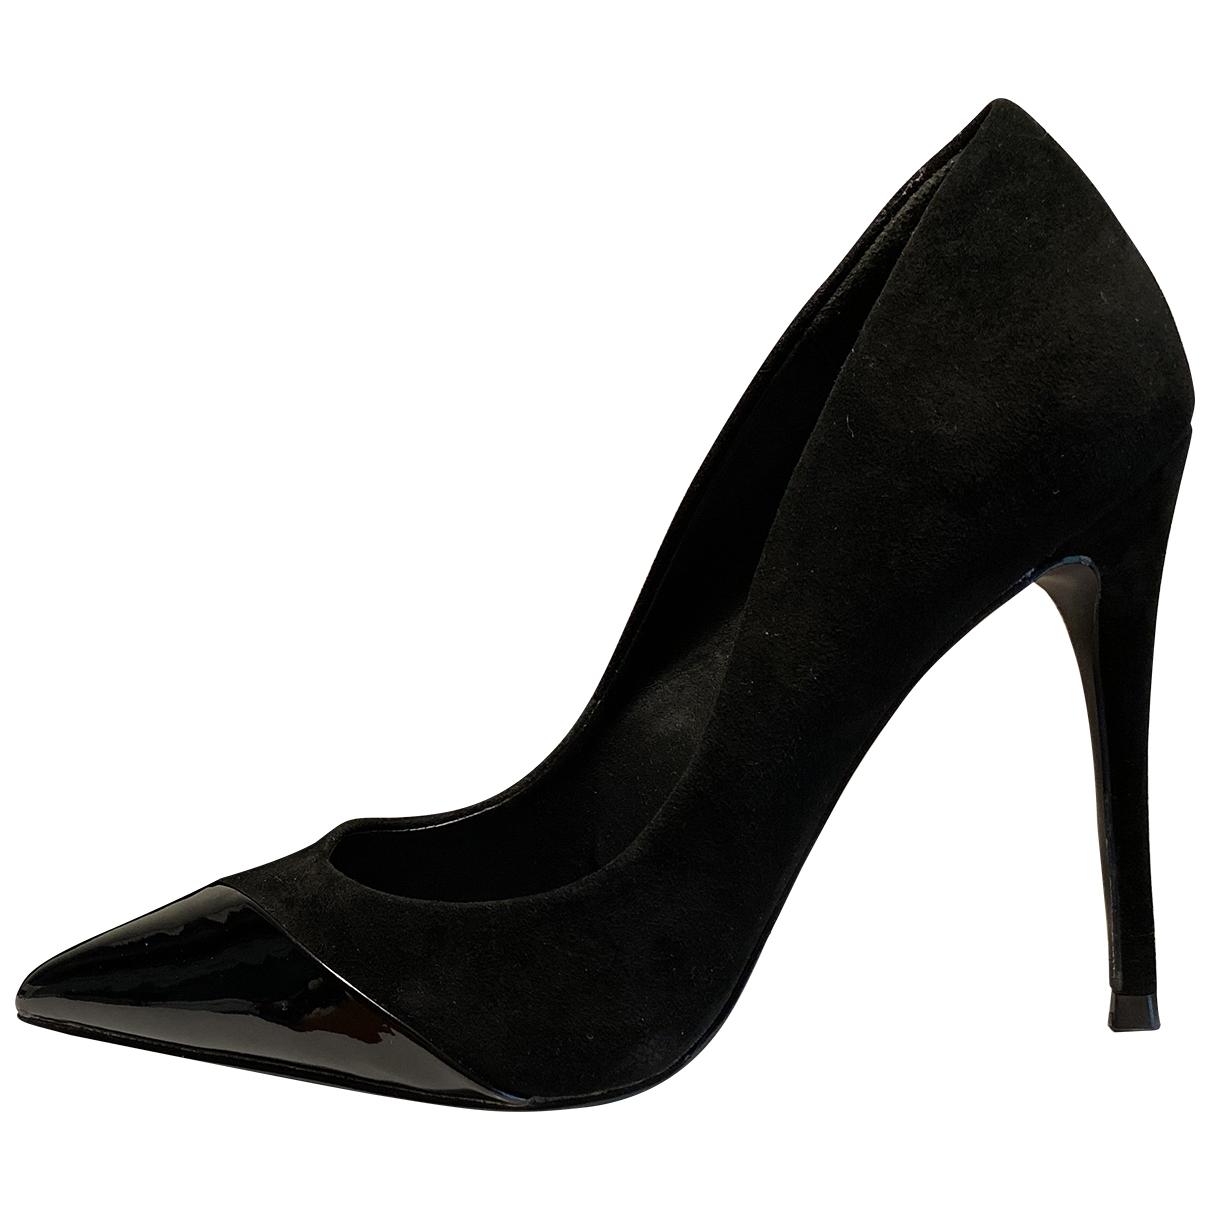 Steve Madden \N Black Suede Heels for Women 37.5 EU